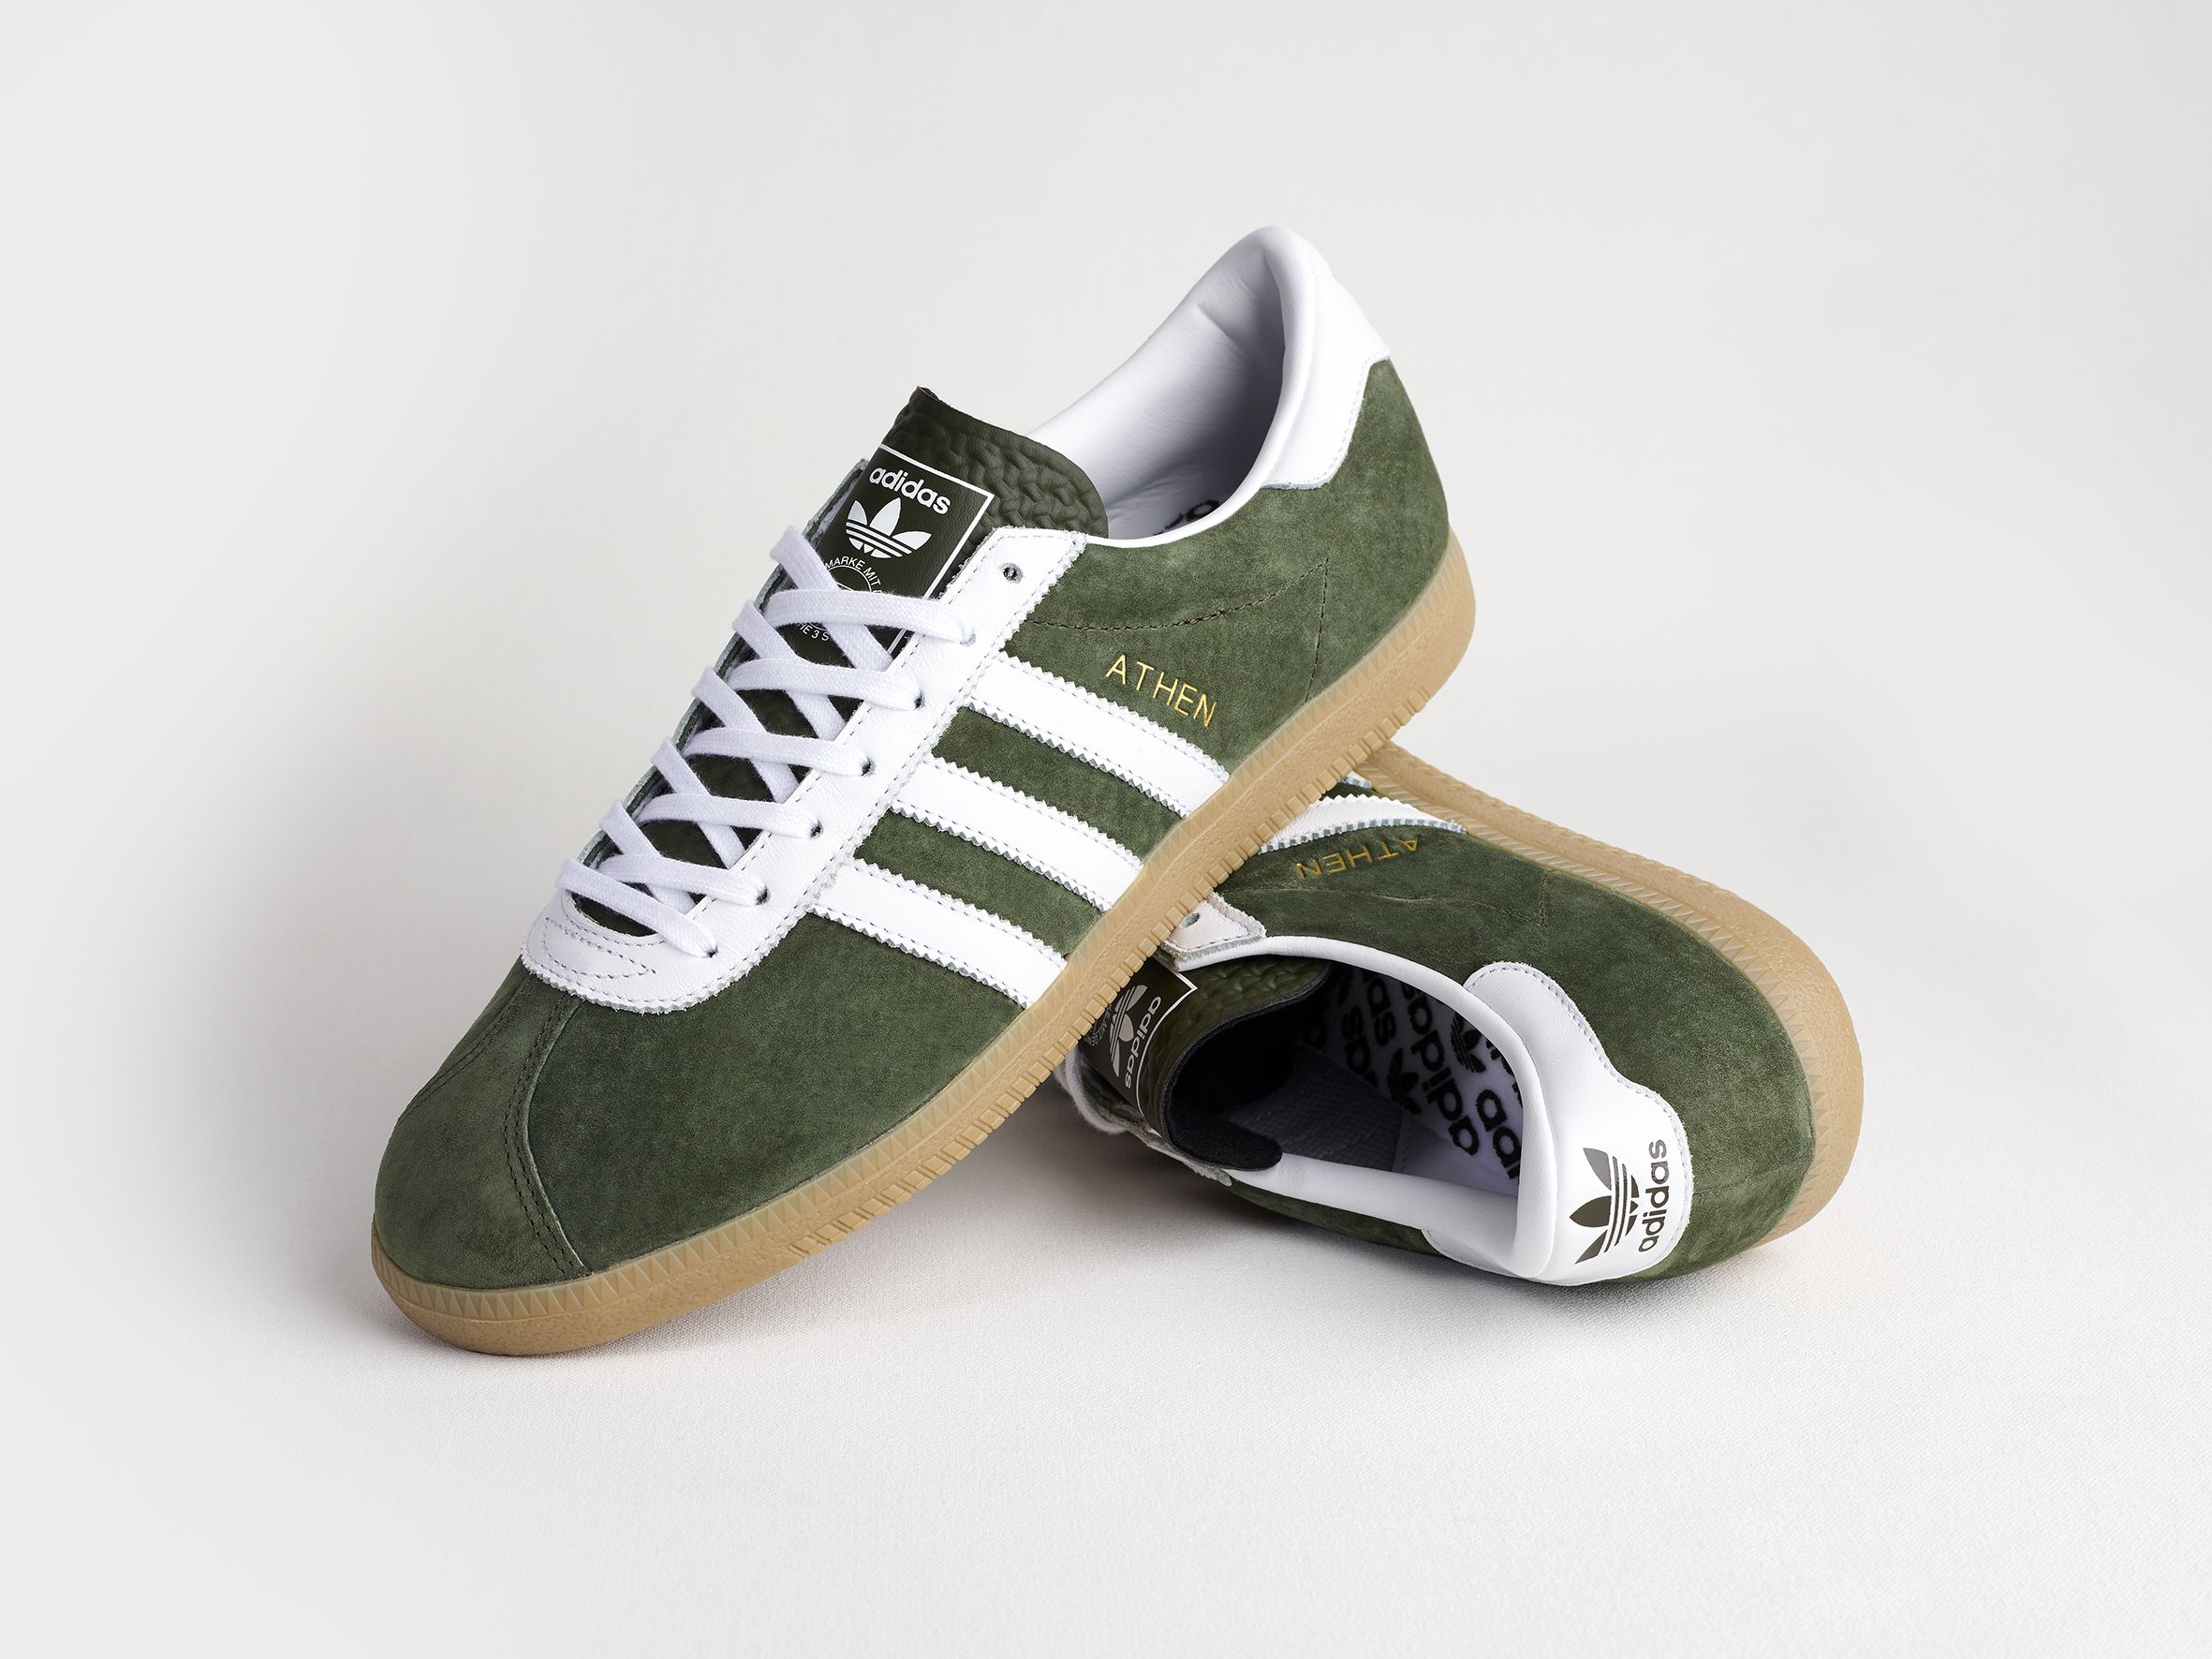 Adidas originali athen moda pinterest adidas, originali e